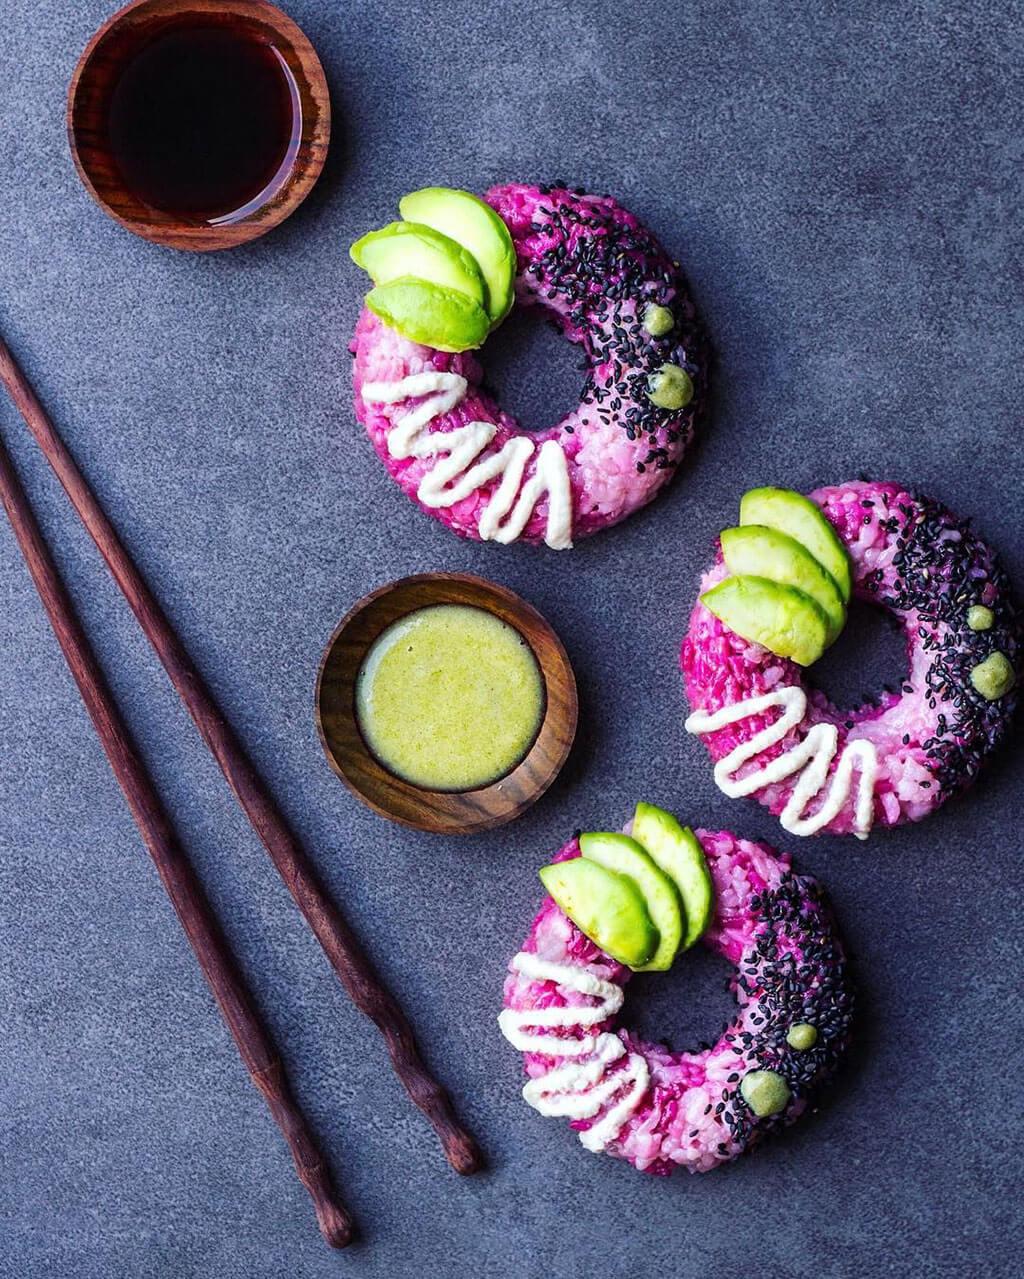 Sushi donut trend